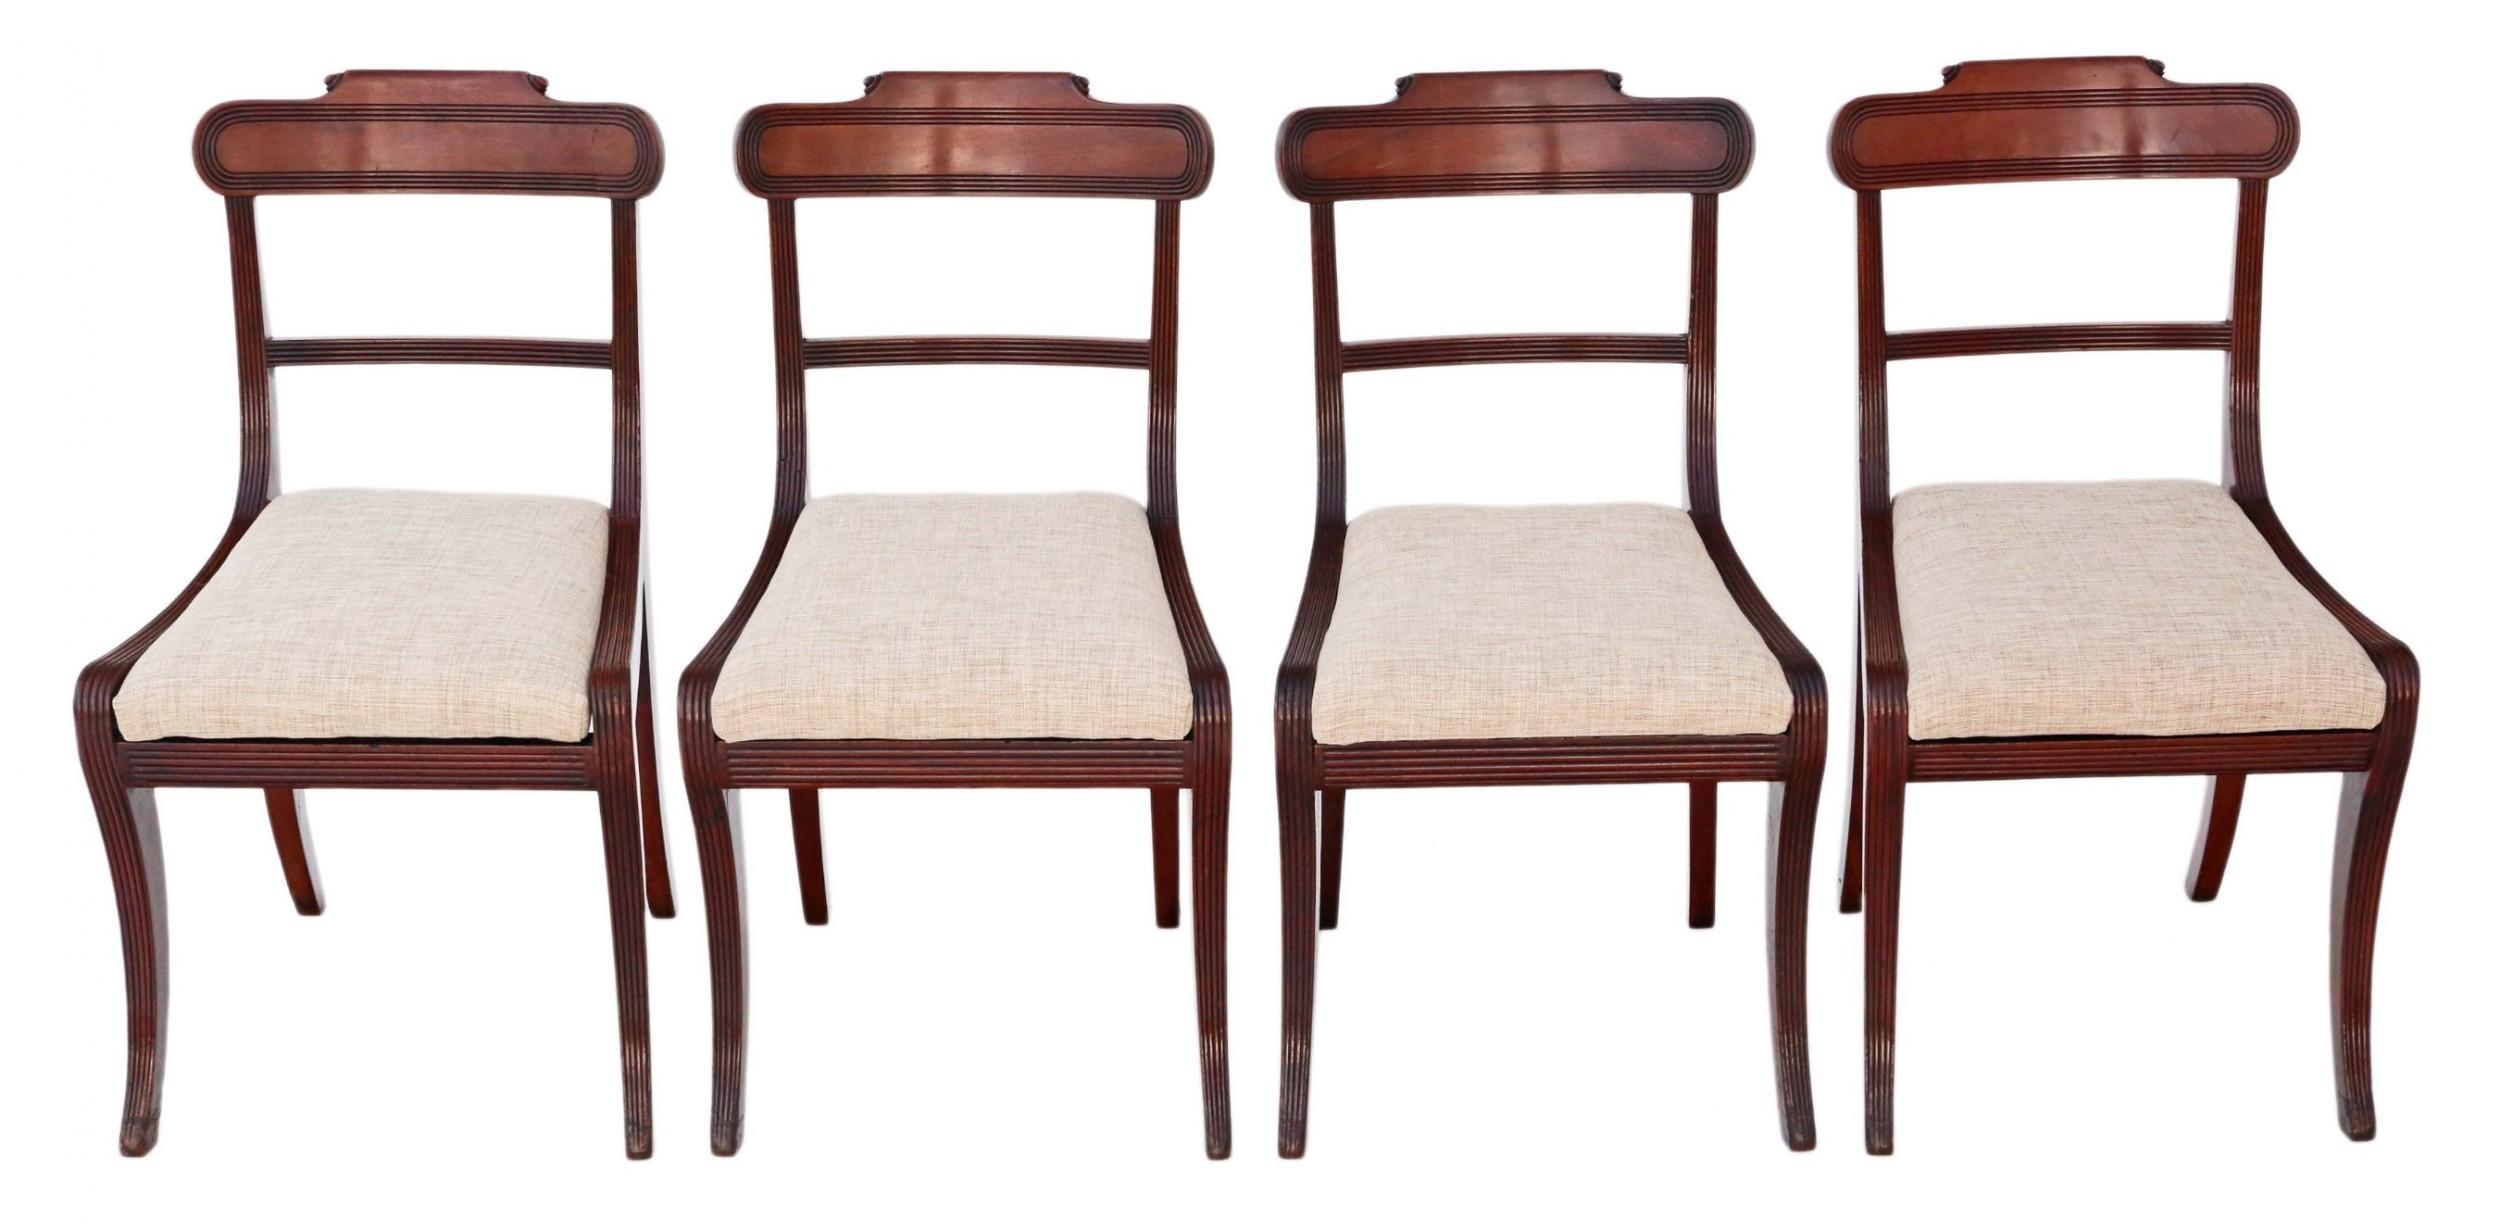 set of 4 regency mahogany dining chairs c1825